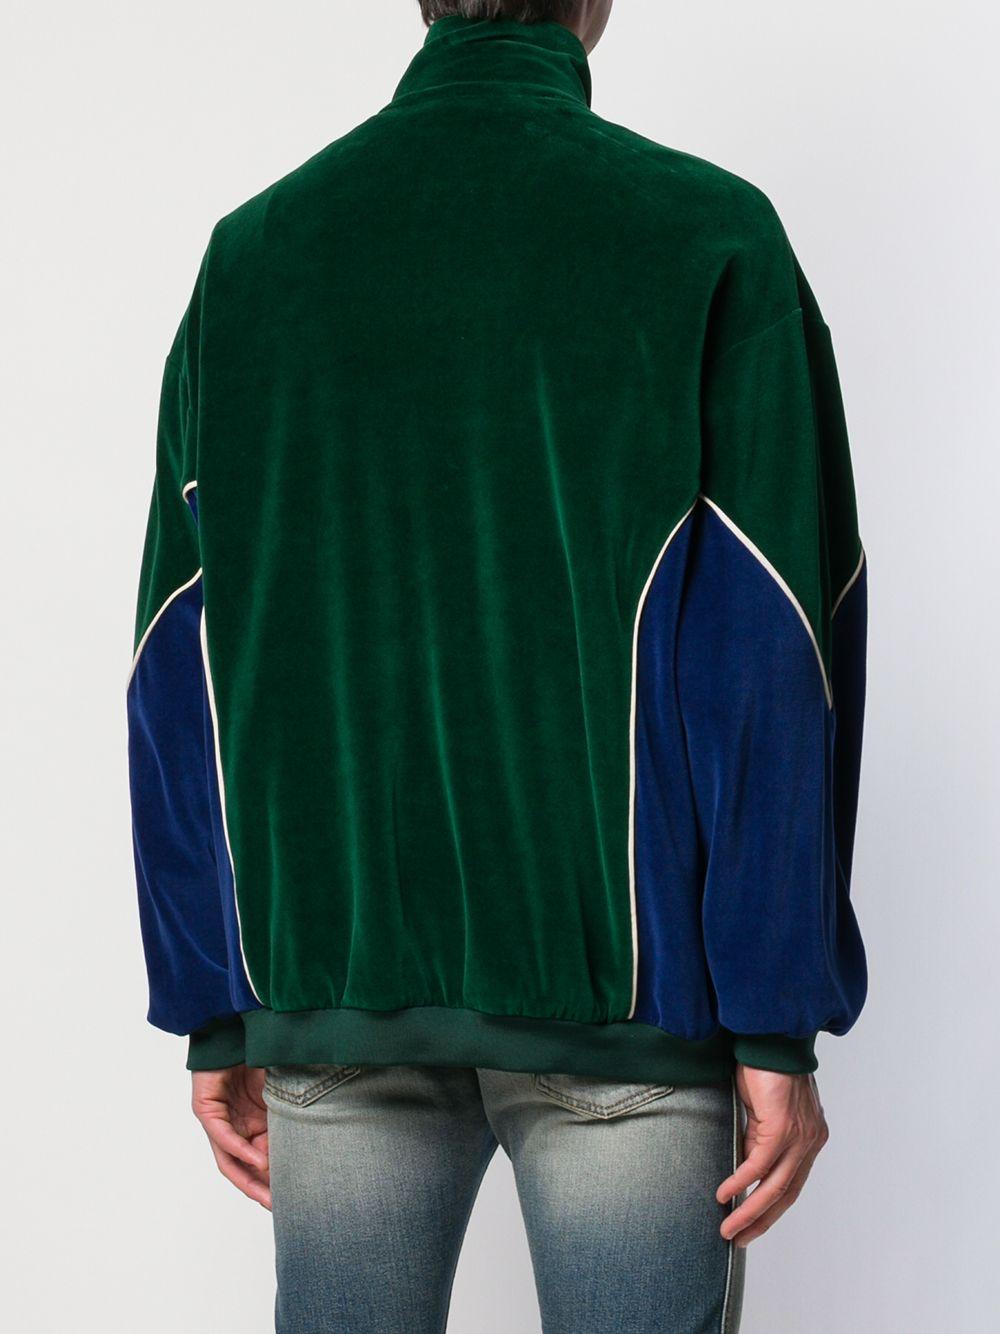 Giacca oversize in velluto a pannelli verde e blu GUCCI | Maglieria Moda | 560253-XJA3J3055